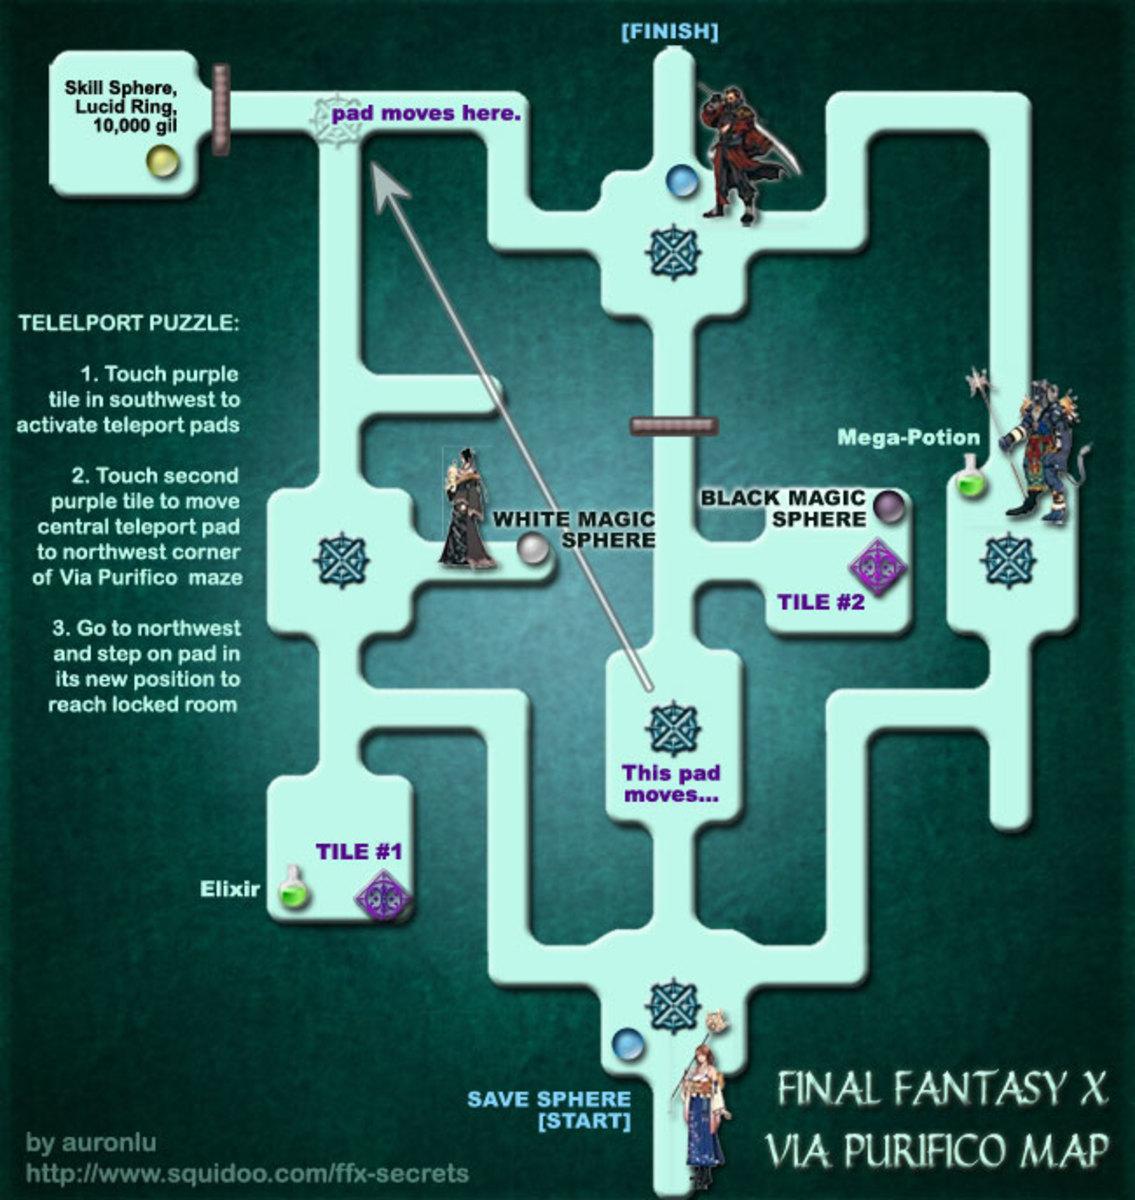 Final Fantasy X - Via Purifico Map